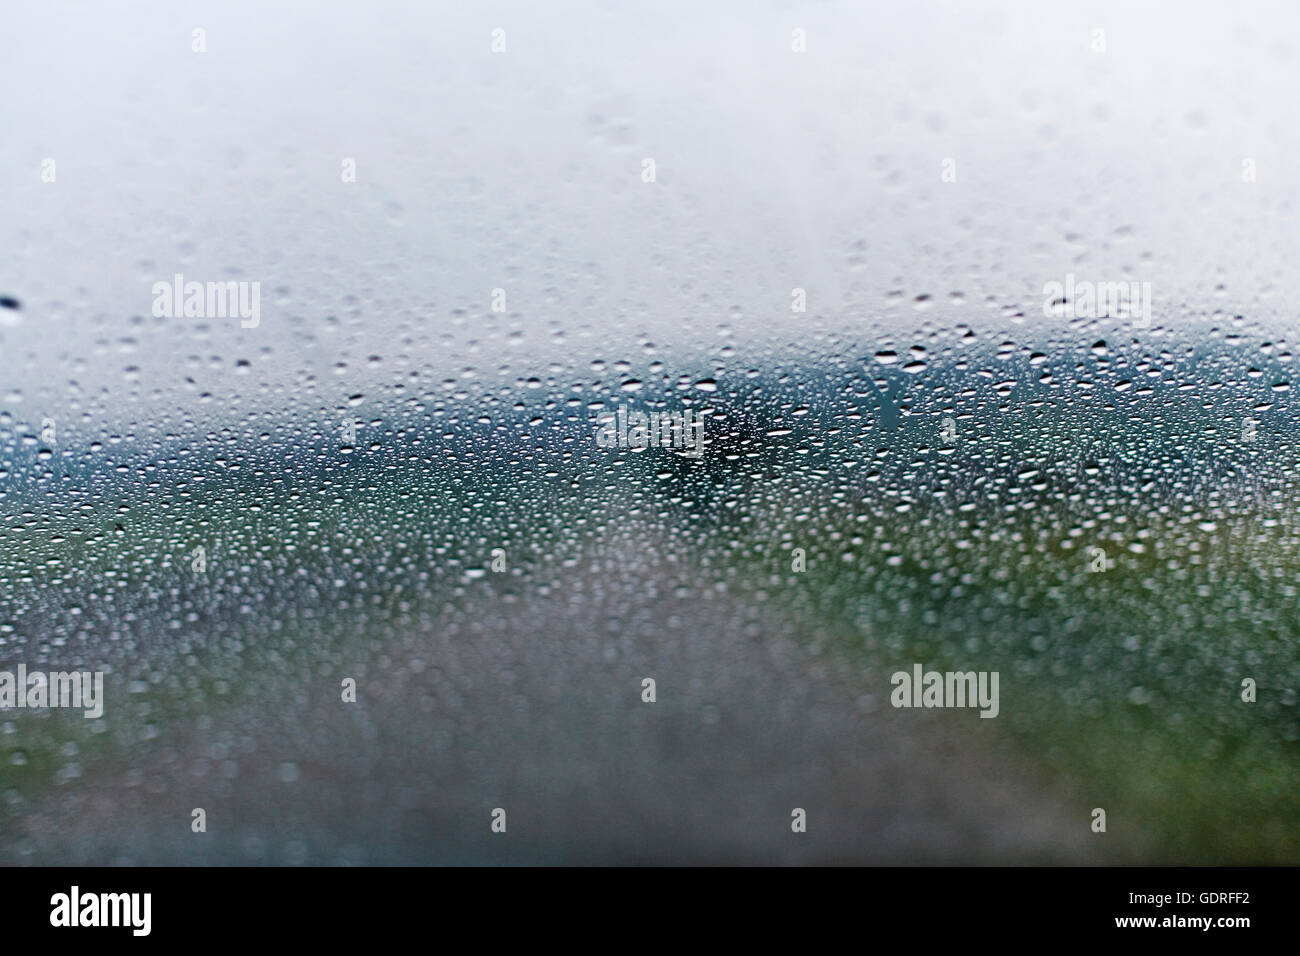 Raindrops on a car window Stock Photo